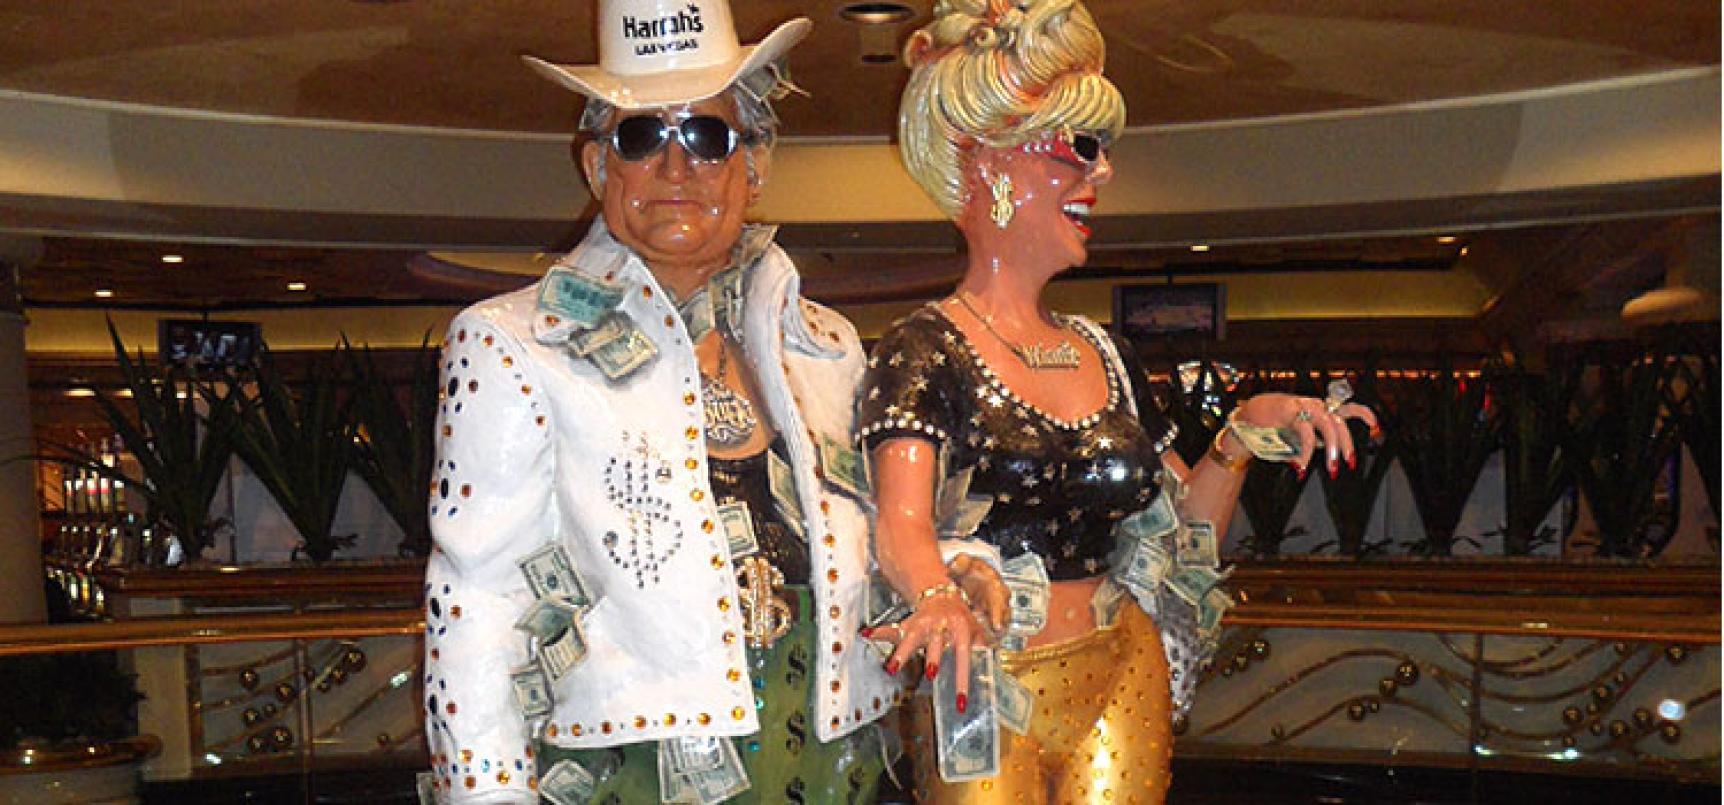 Harrah's Hotel & Casino Las Vegas